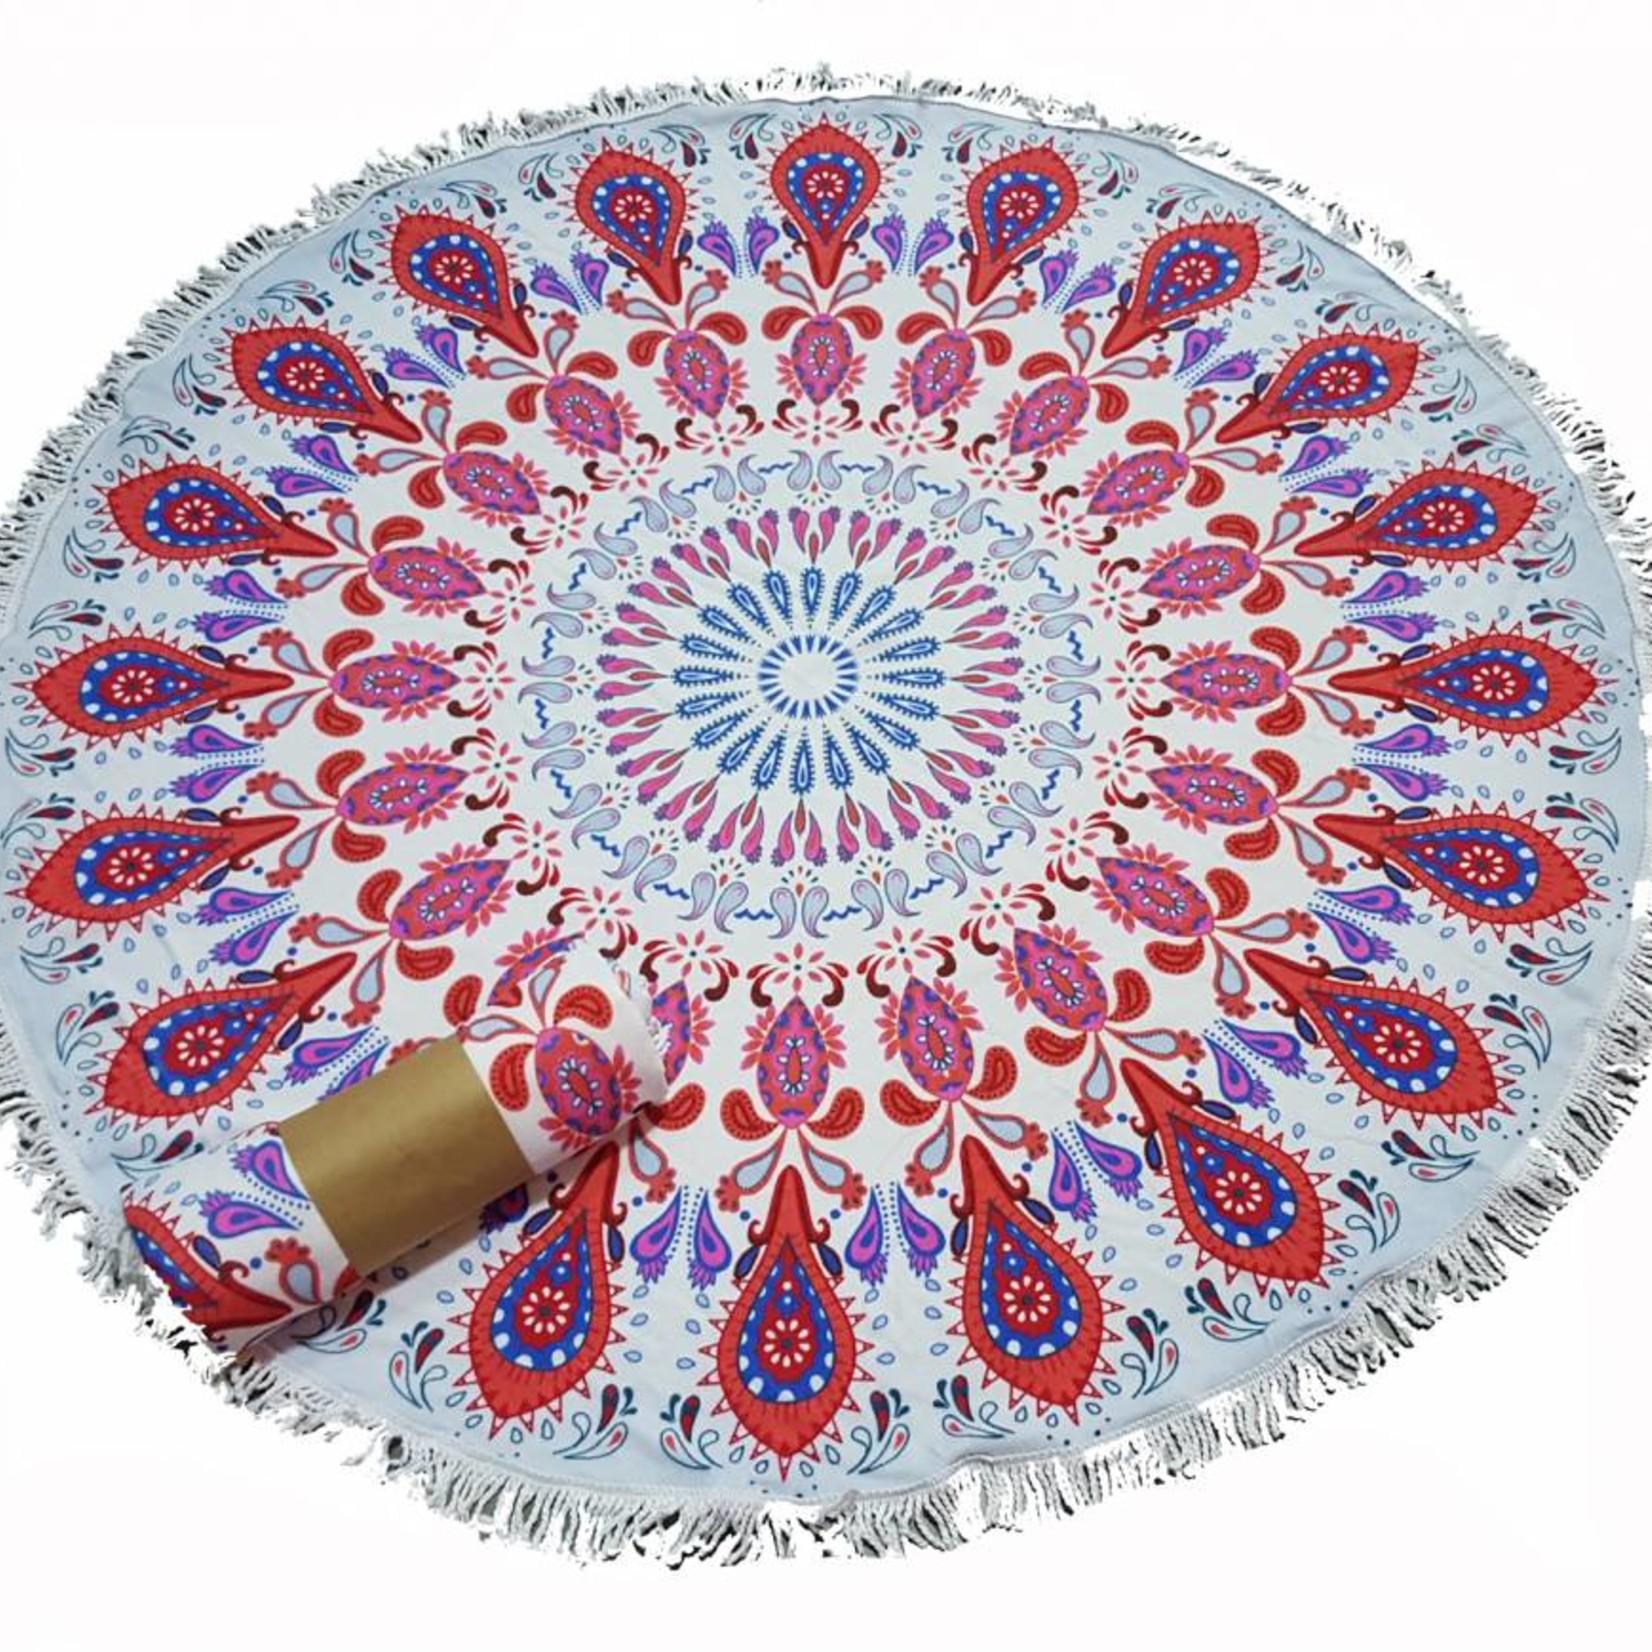 Roundie beach towel - rond strandlaken - badstof- boho - Ibiza handdoek bali stijl - Mandala Red